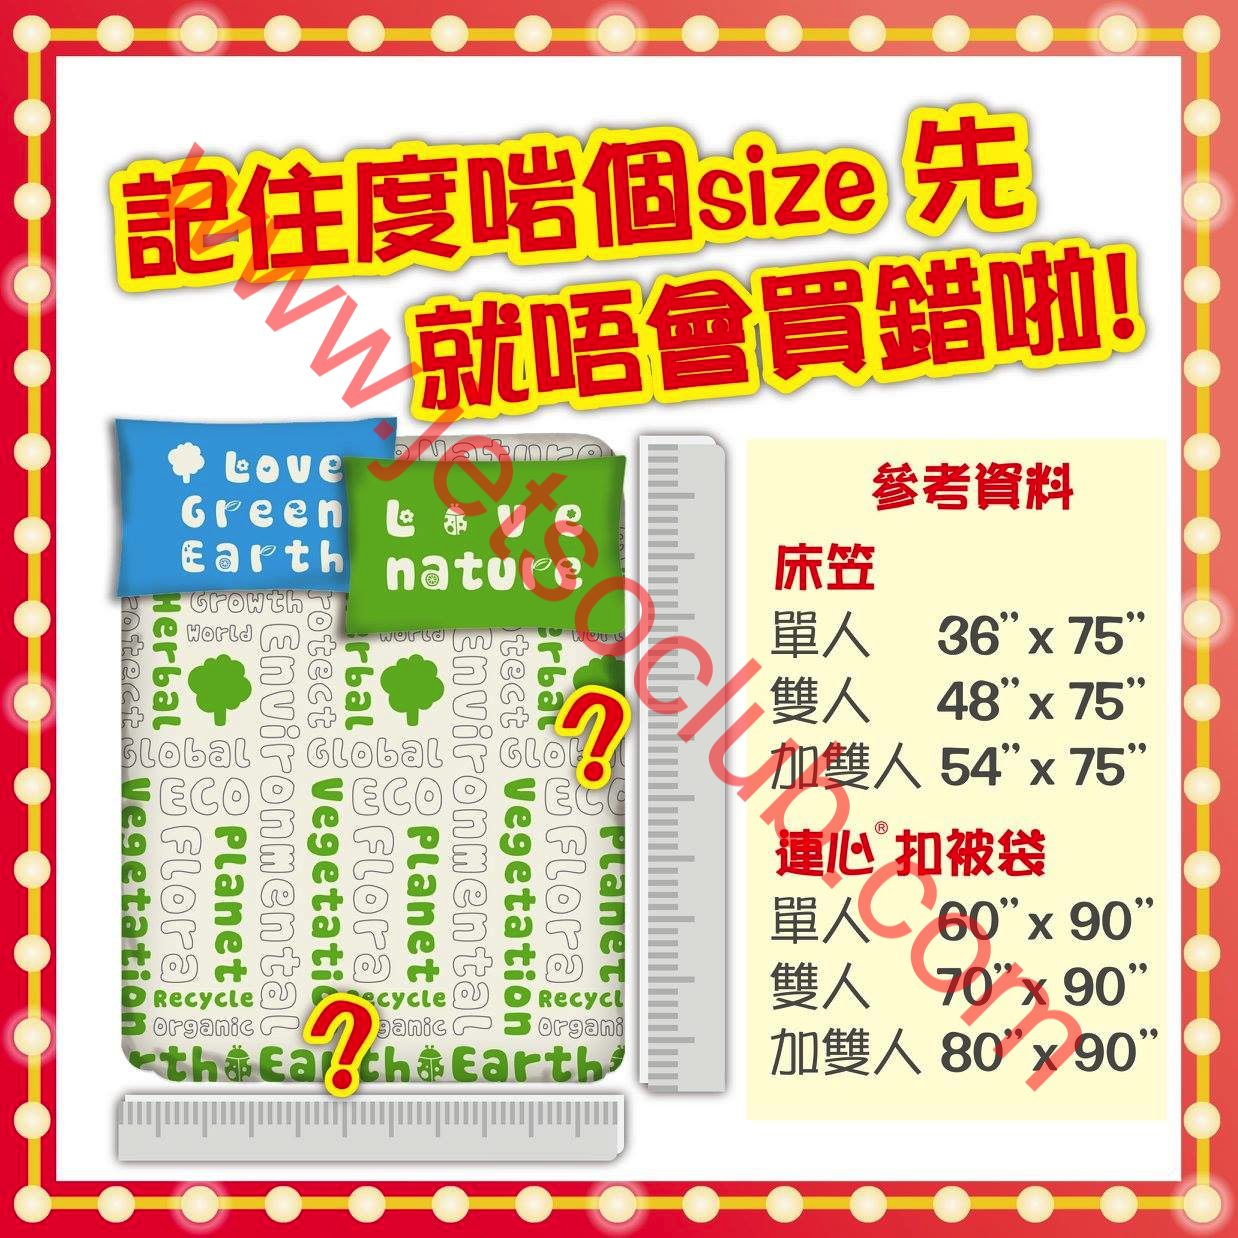 A-FONTANE 雅芳婷:年度開倉 低至2折(11-20/3) ( Jetso Club 著數俱樂部 )